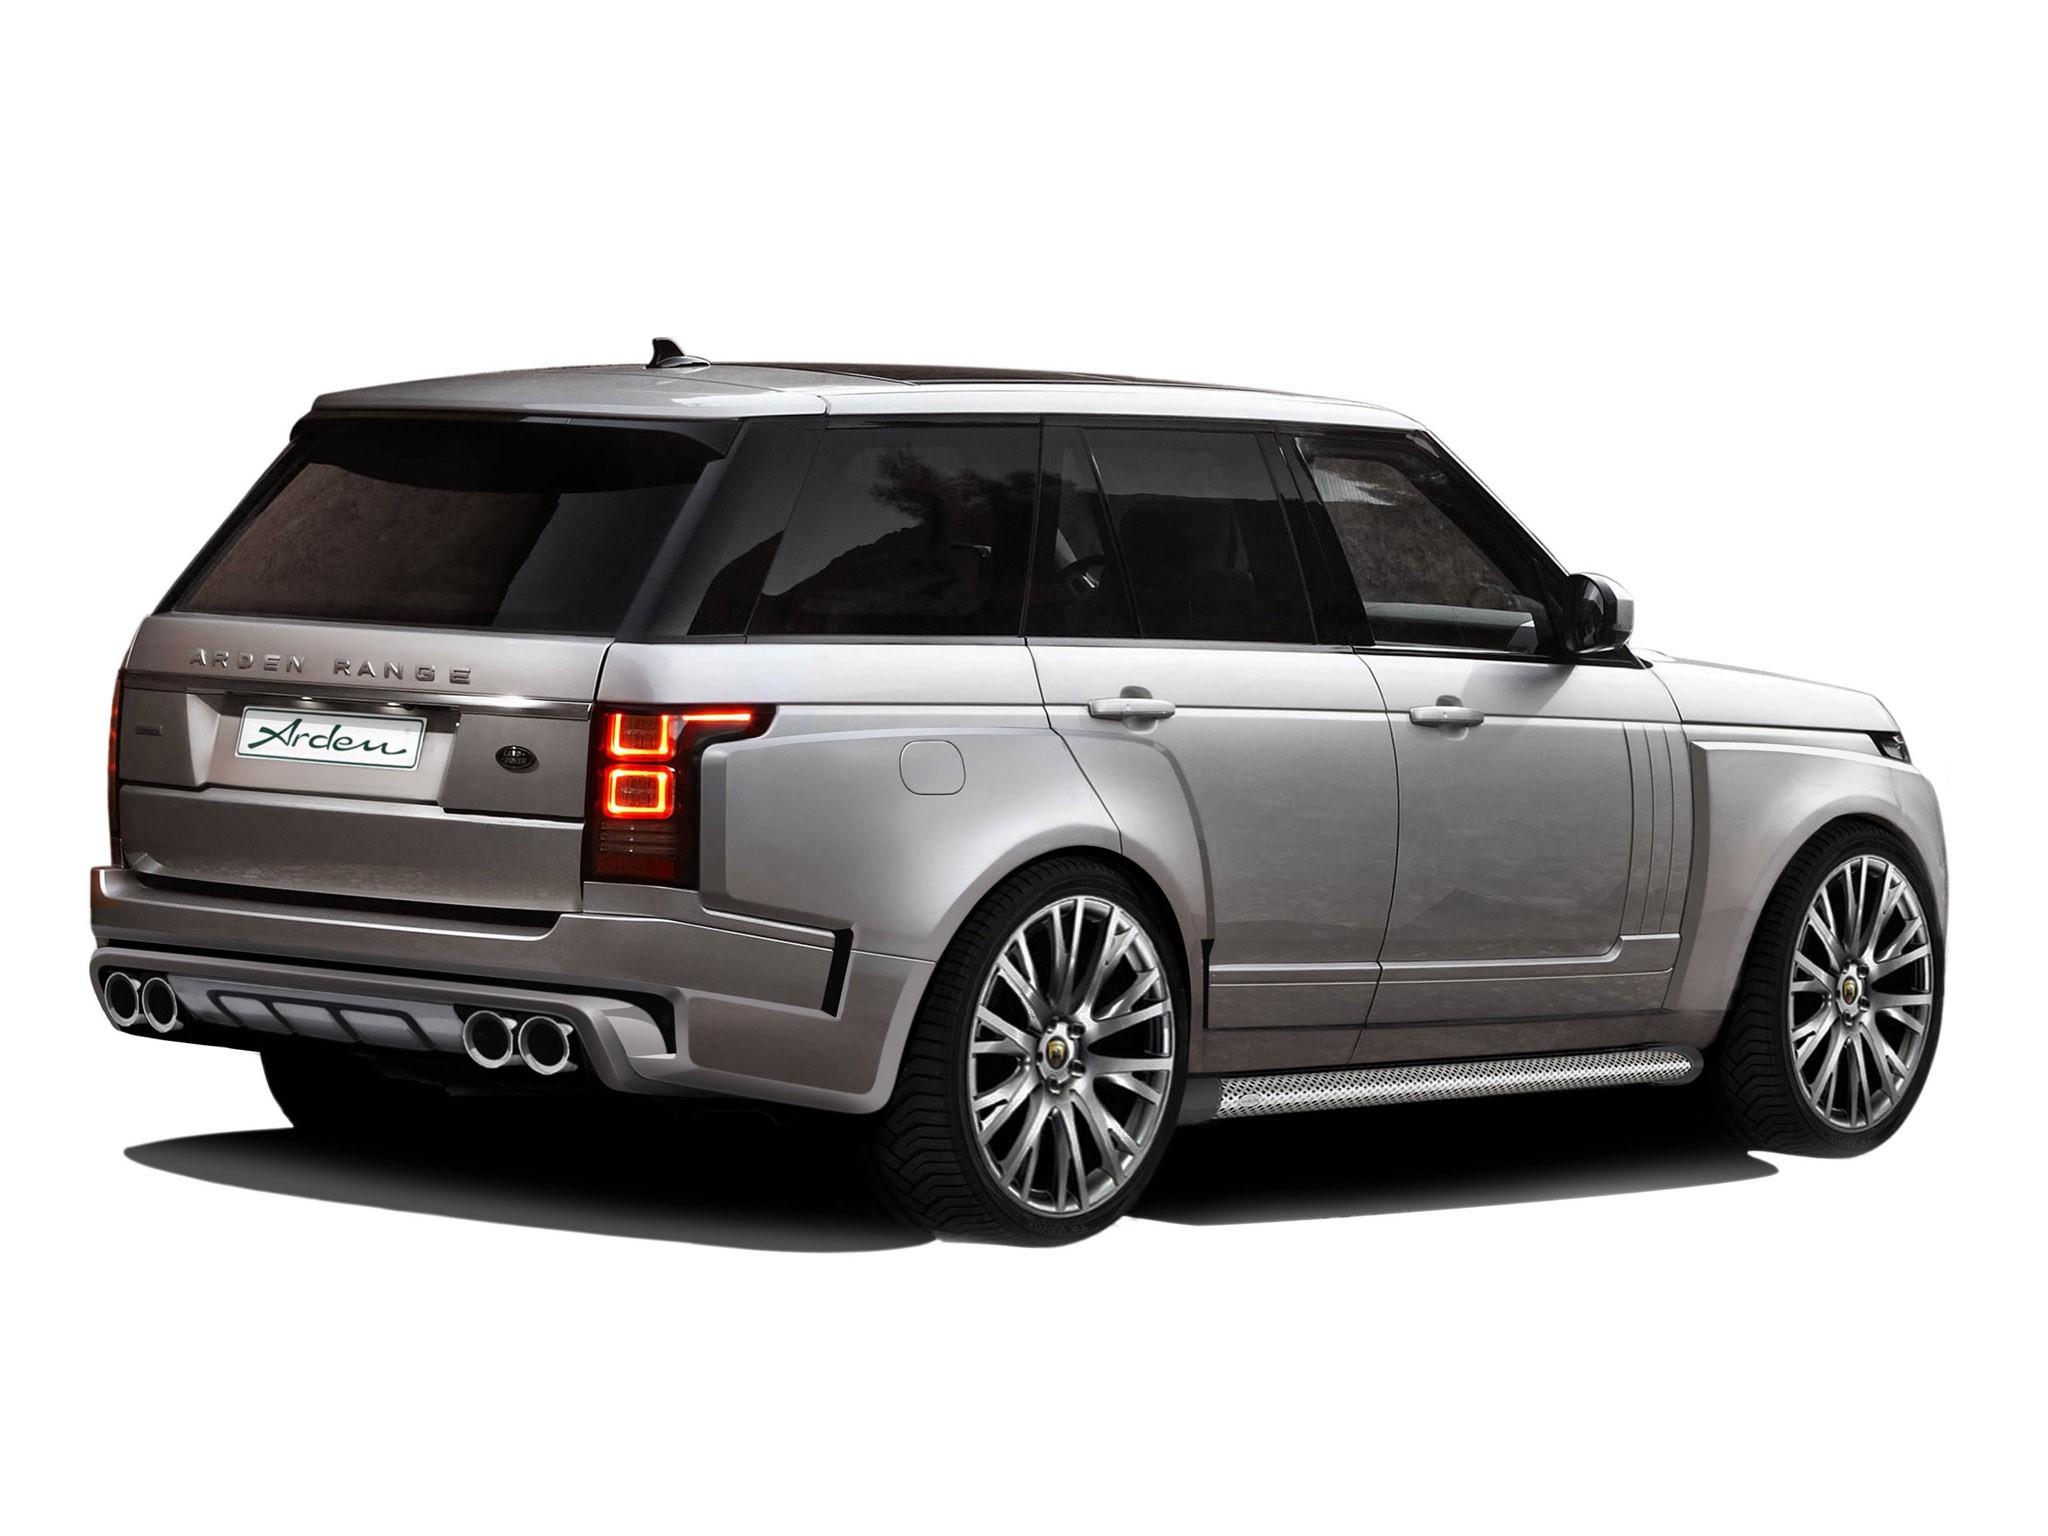 2013 Arden Range Rover AR9